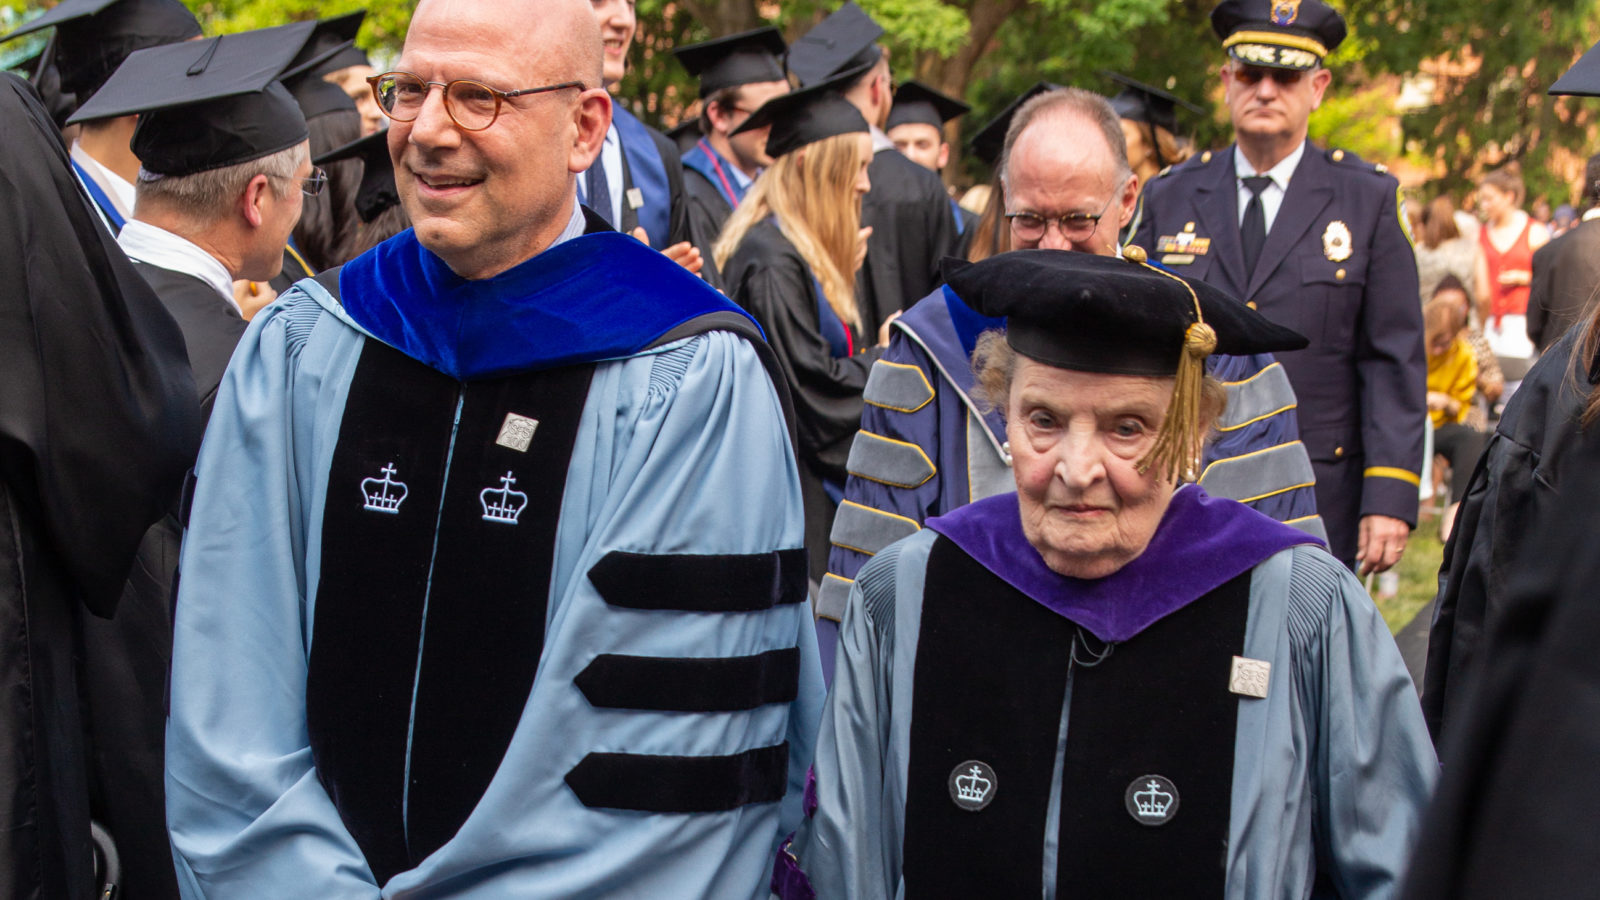 President Dean Helman & Madeline Albright graduation